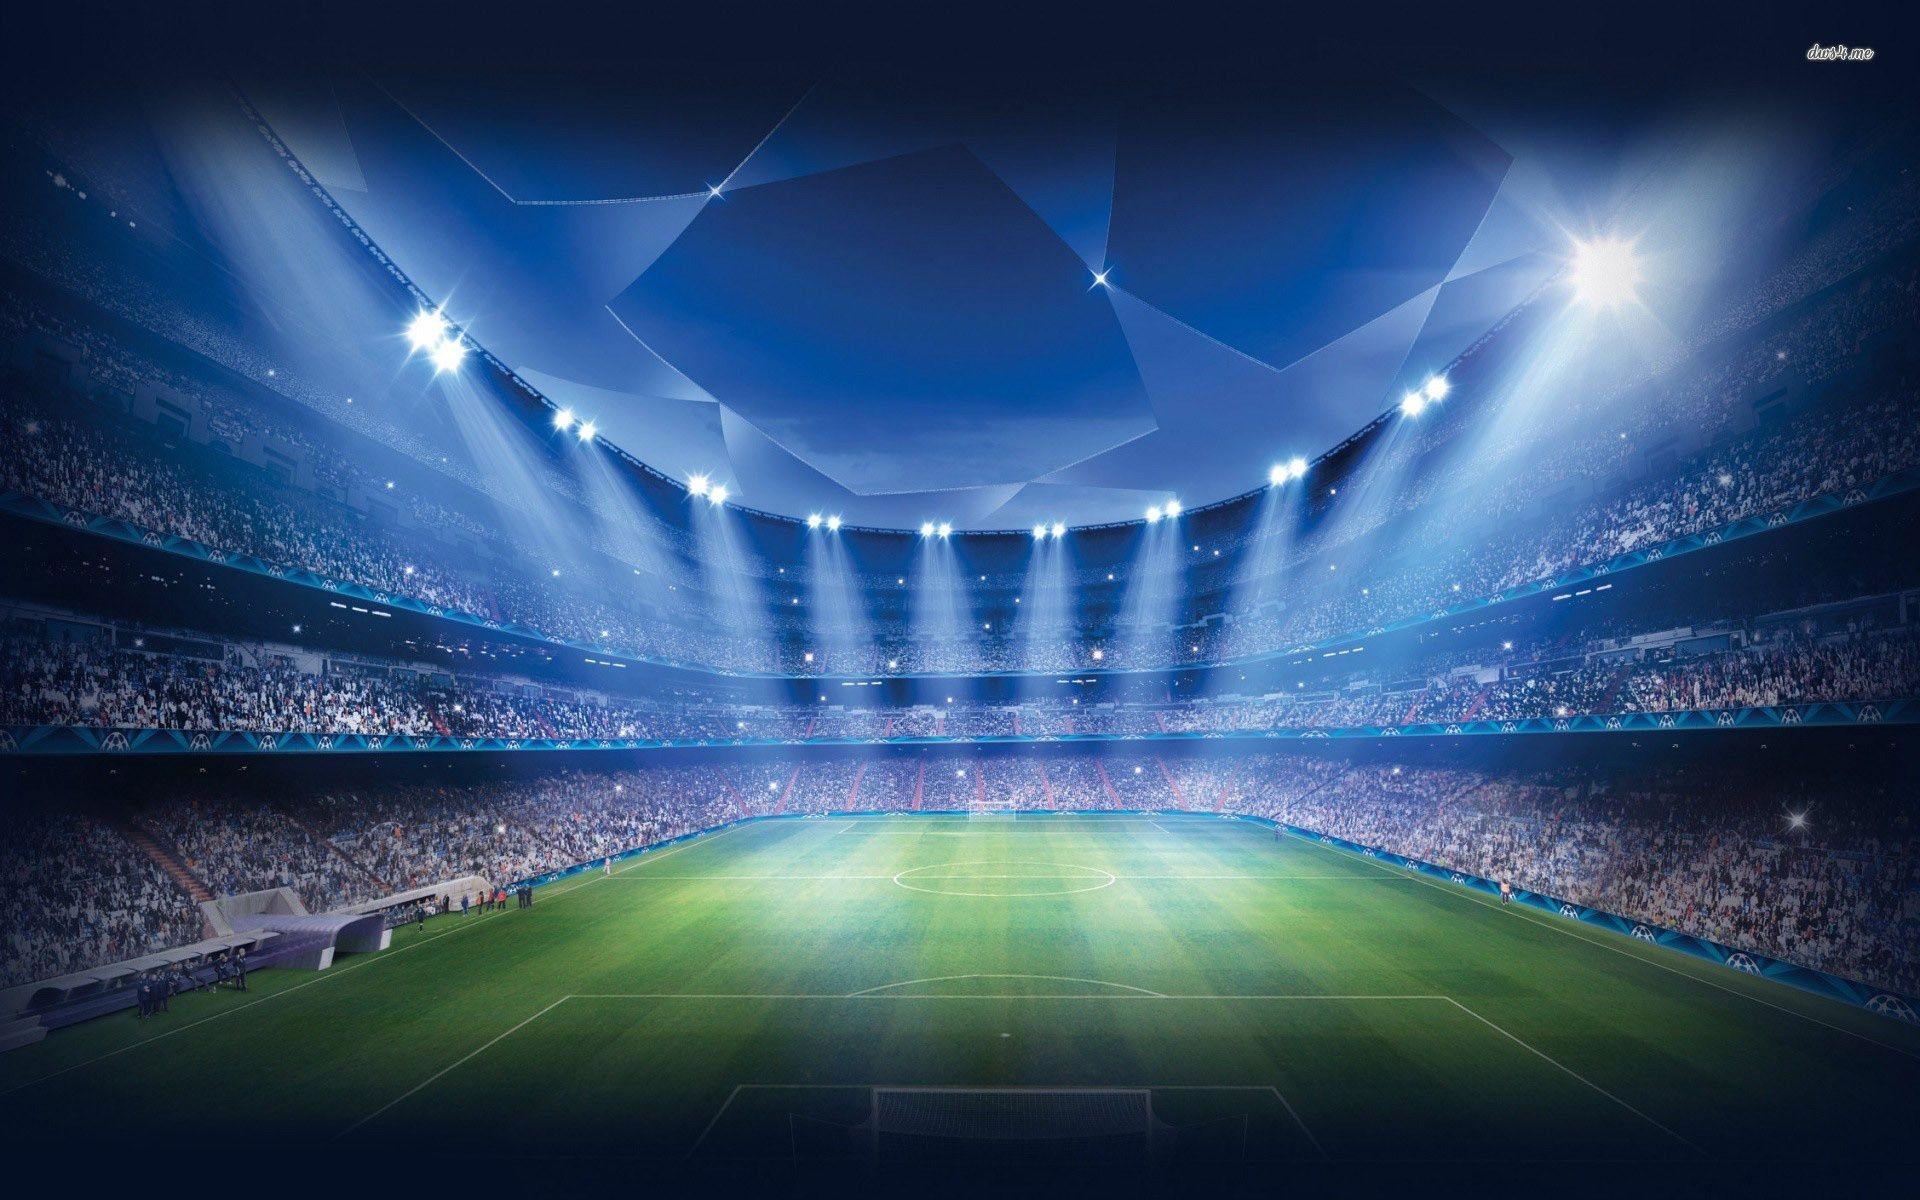 Stadium Wallpapers Full HD wallpaper search #7610